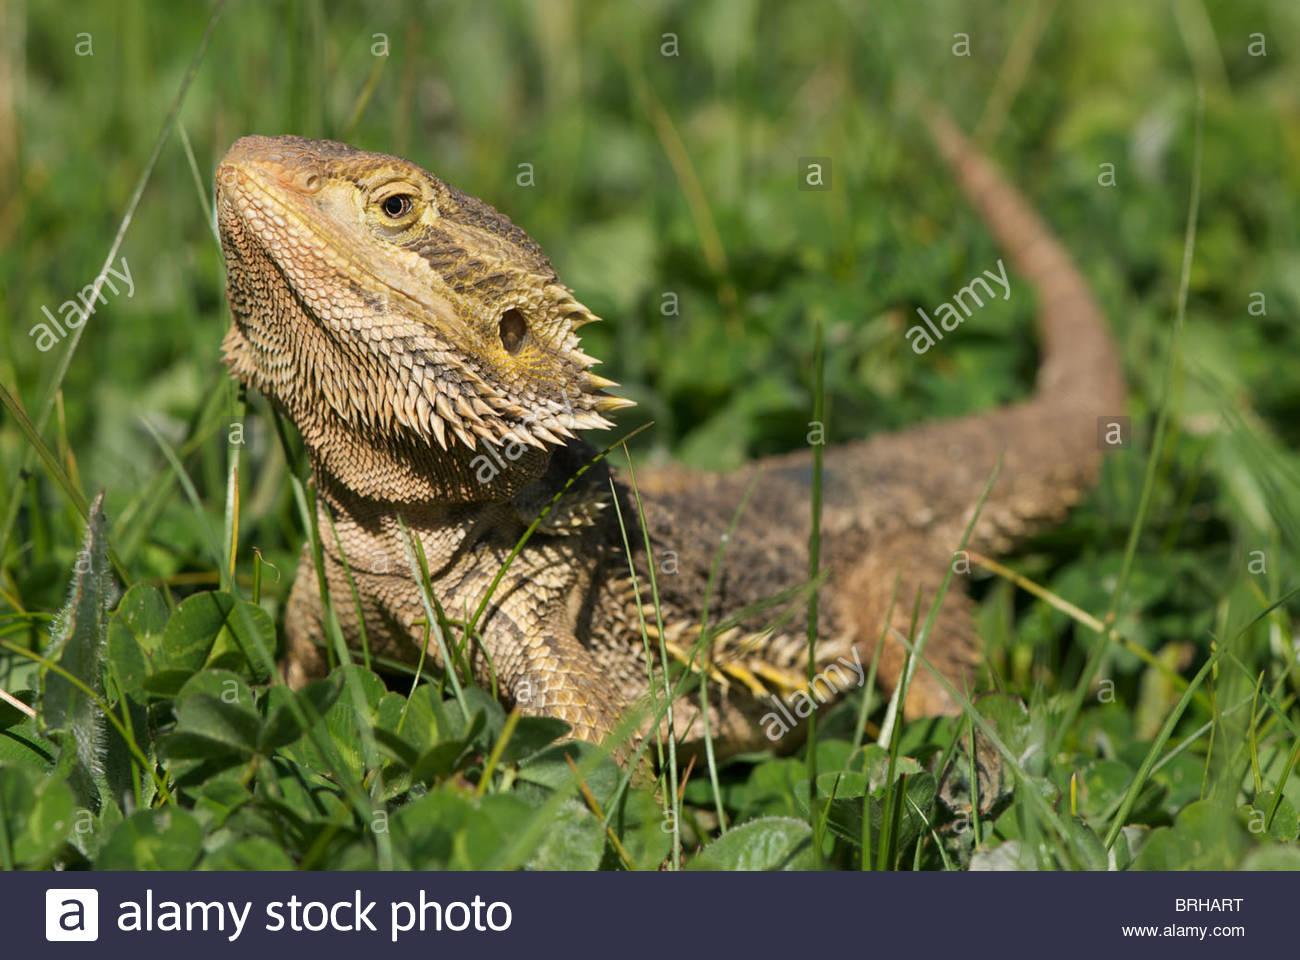 inland bearded dragon sitting